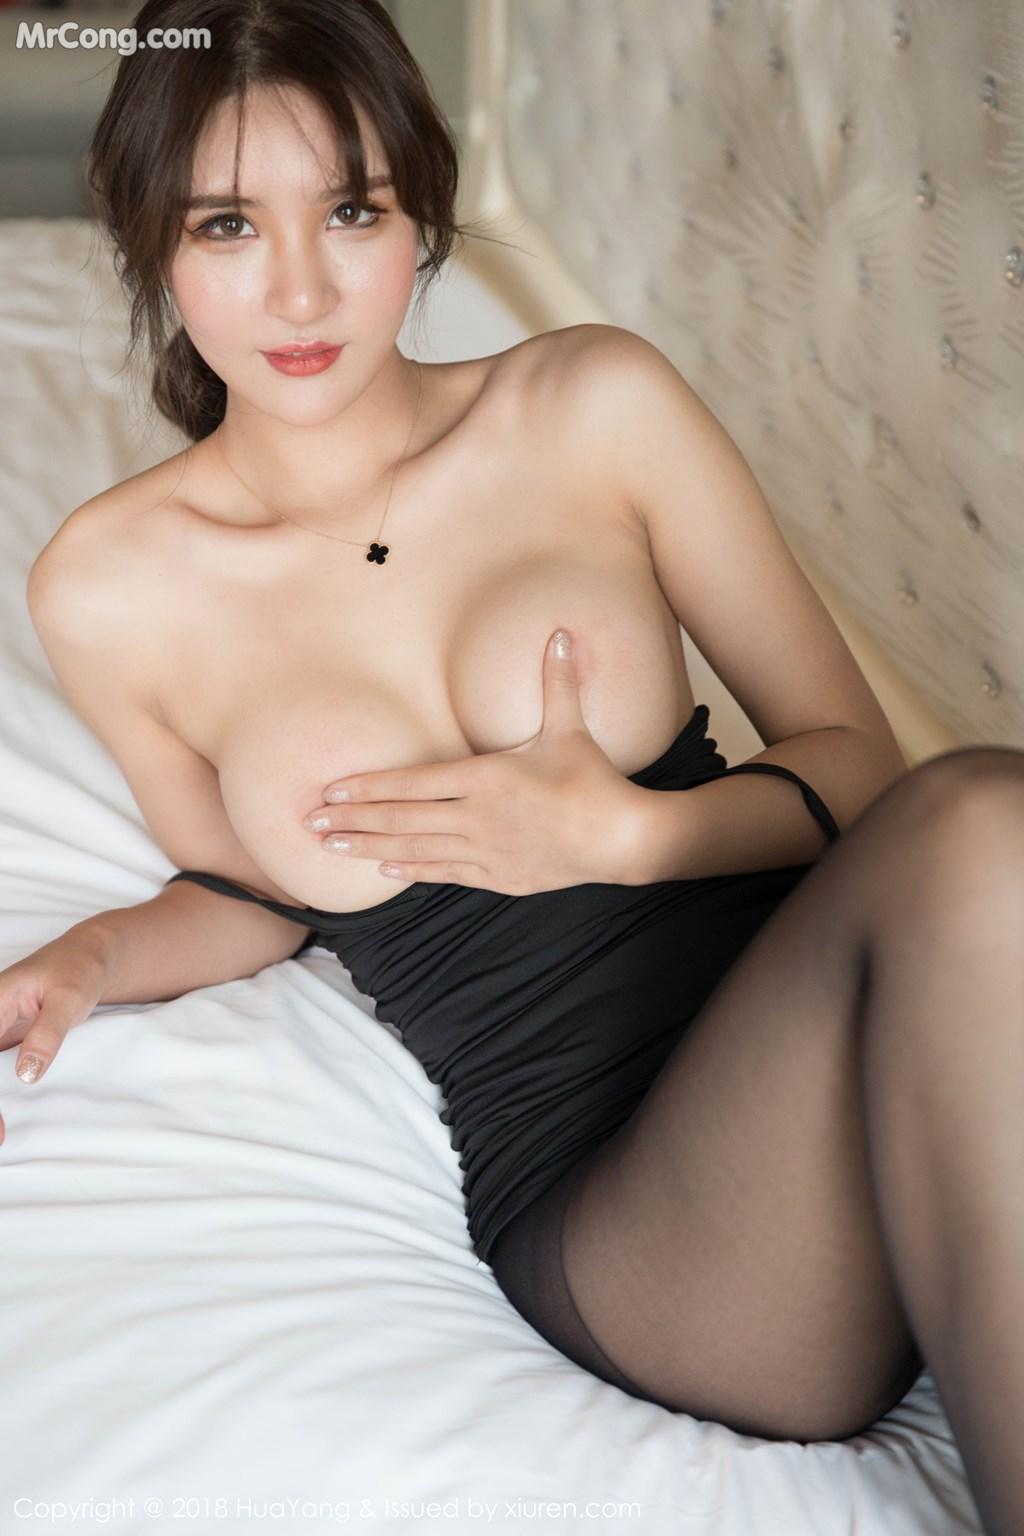 Image HuaYang-2018-11-14-Vol.095-SOLO-MrCong.com-027 in post HuaYang 2018-11-14 Vol.095: Người mẫu SOLO-尹菲 (46 ảnh)